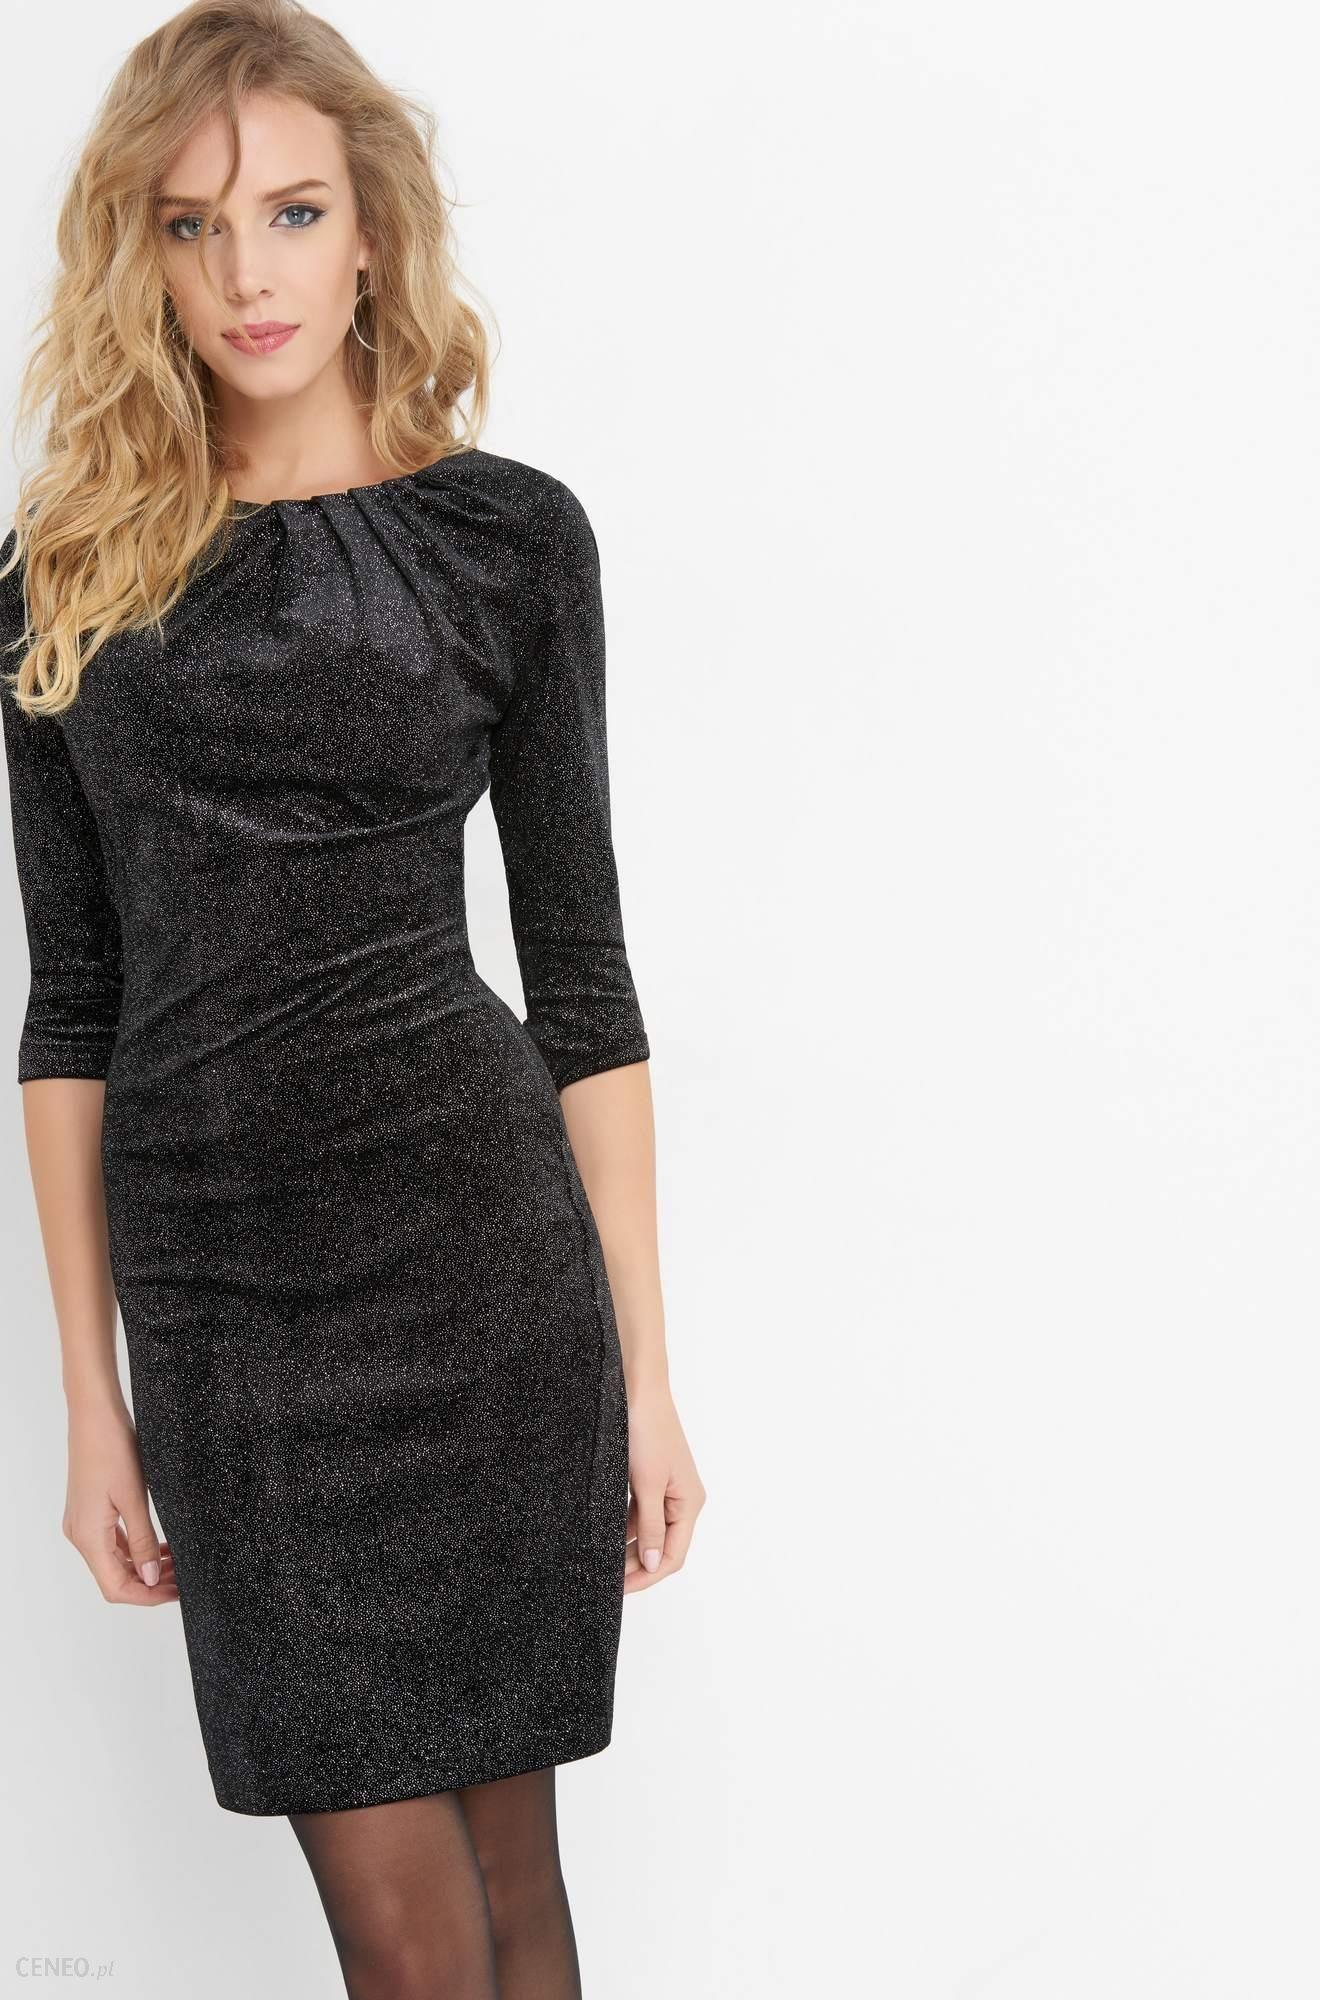 b48f5c0592 Orsay Aksamitna sukienka z brokatem - Ceny i opinie - Ceneo.pl